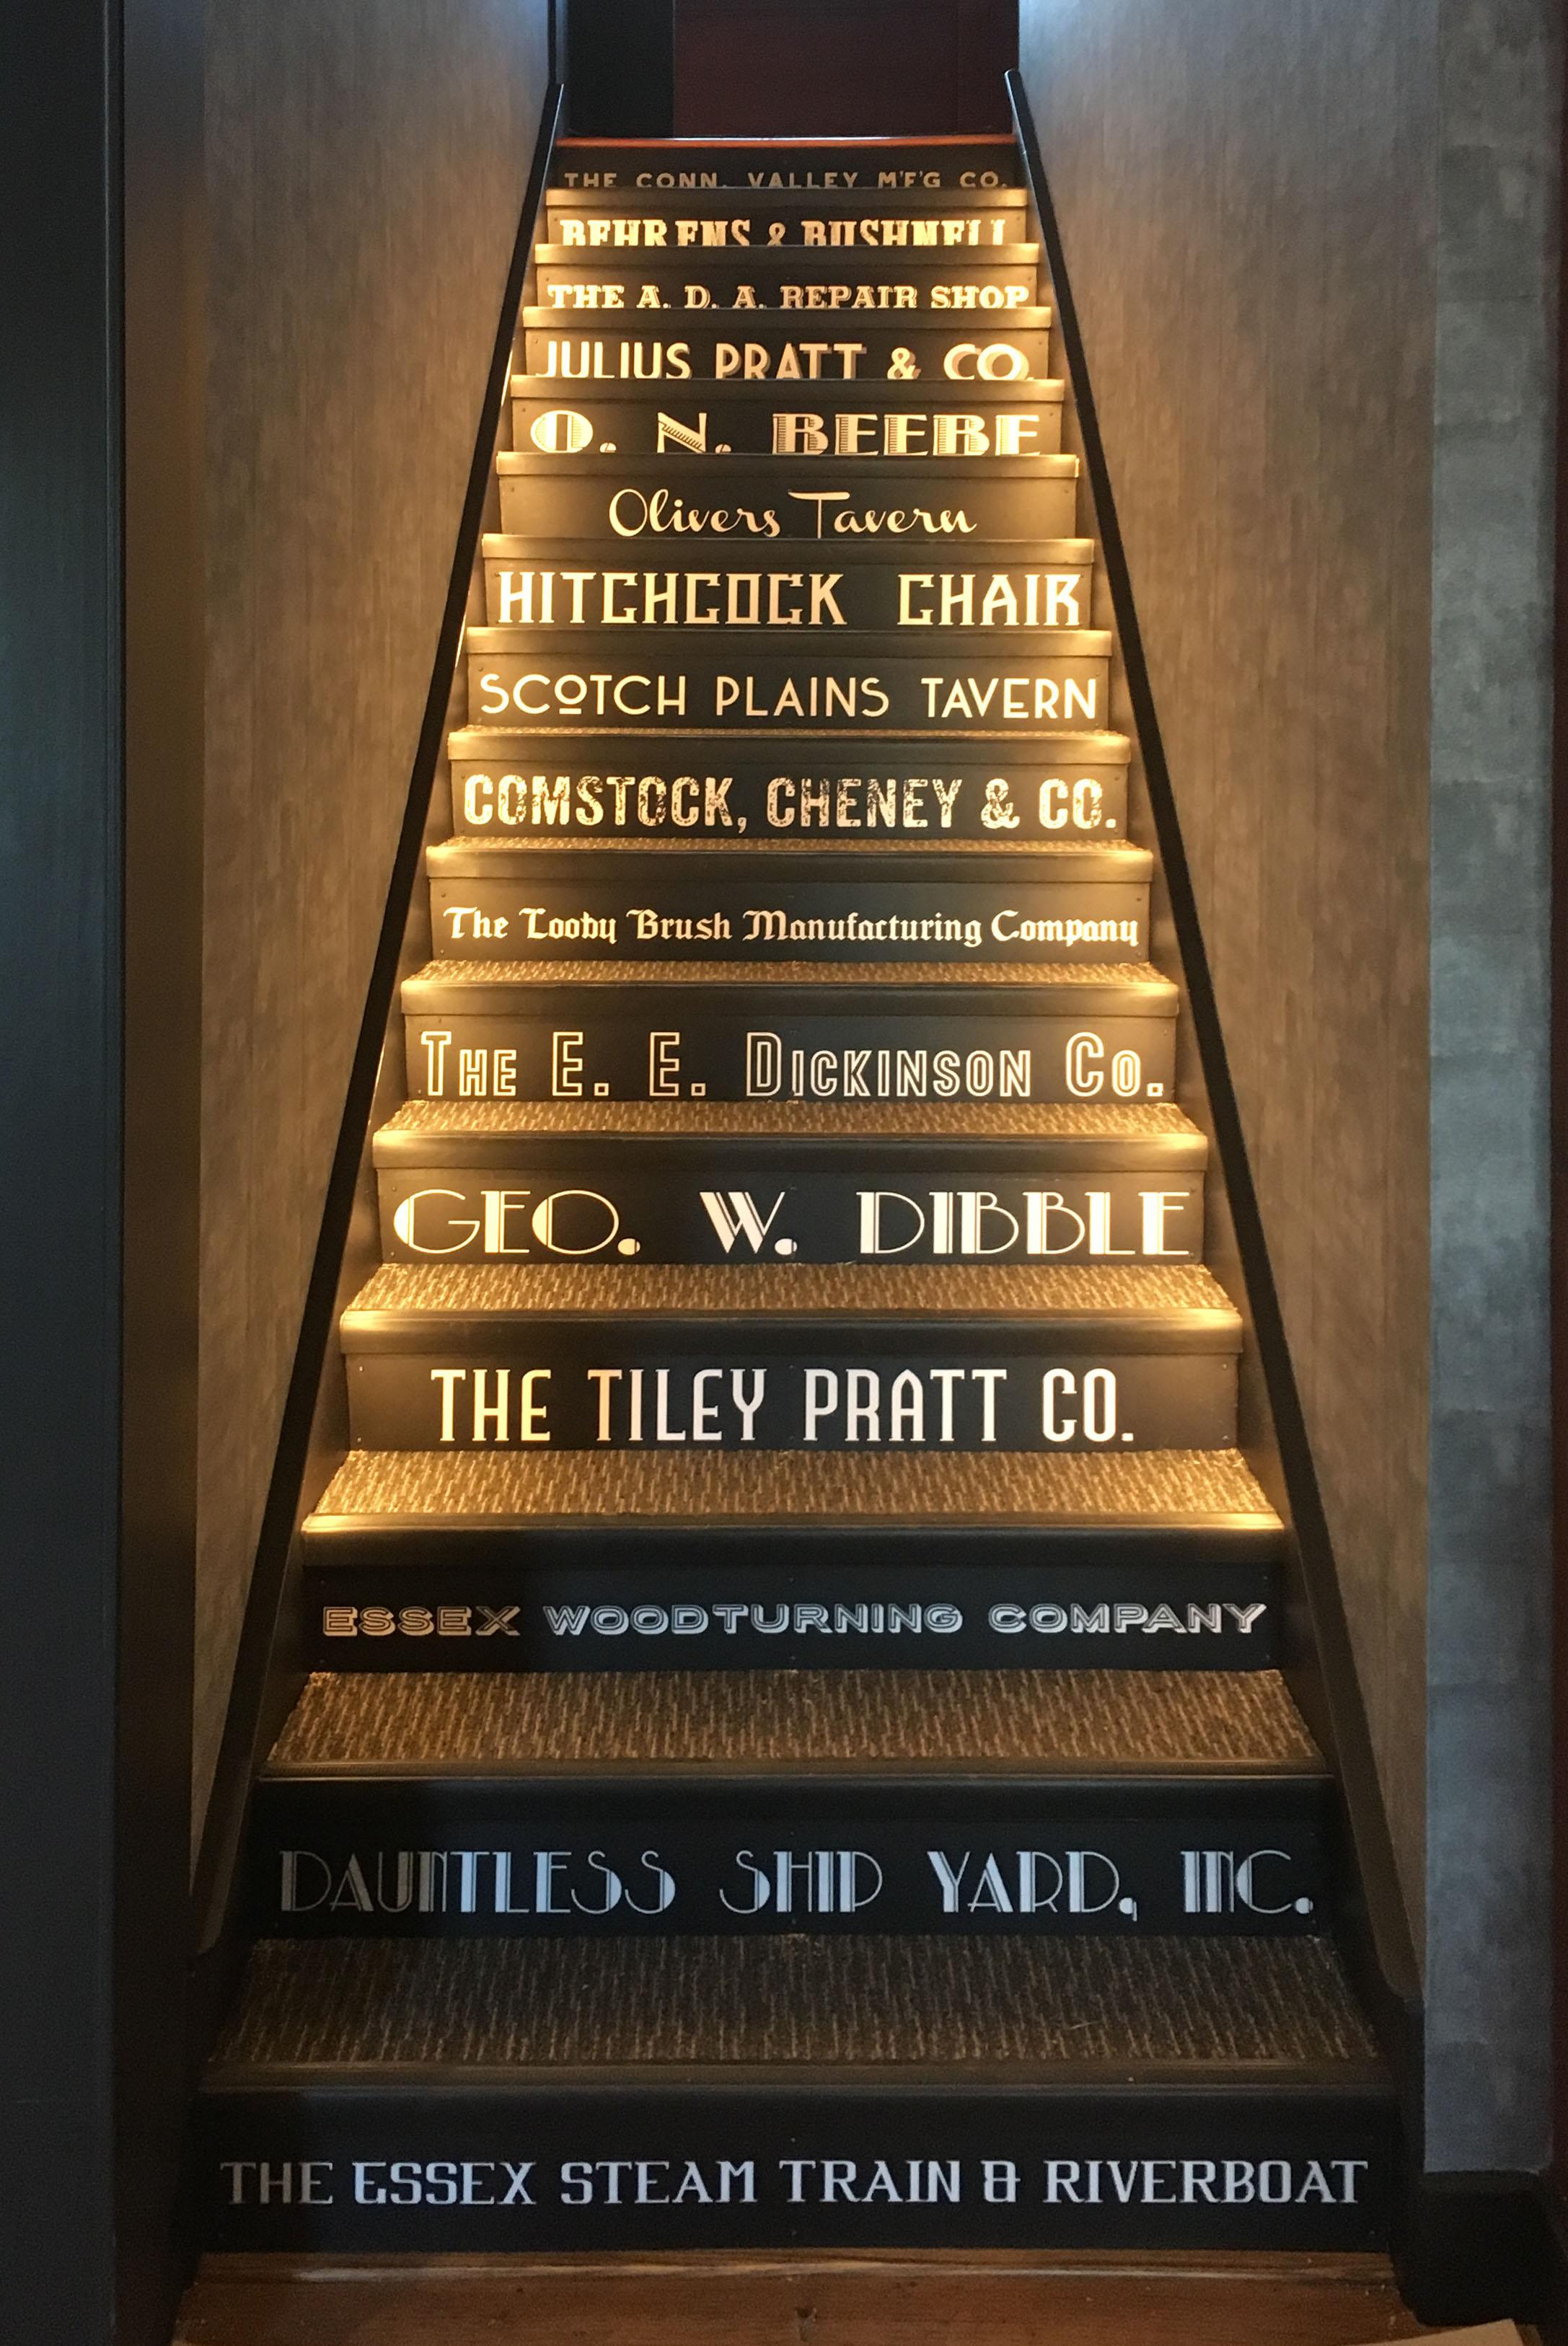 Scotch Plains Tavern stairs